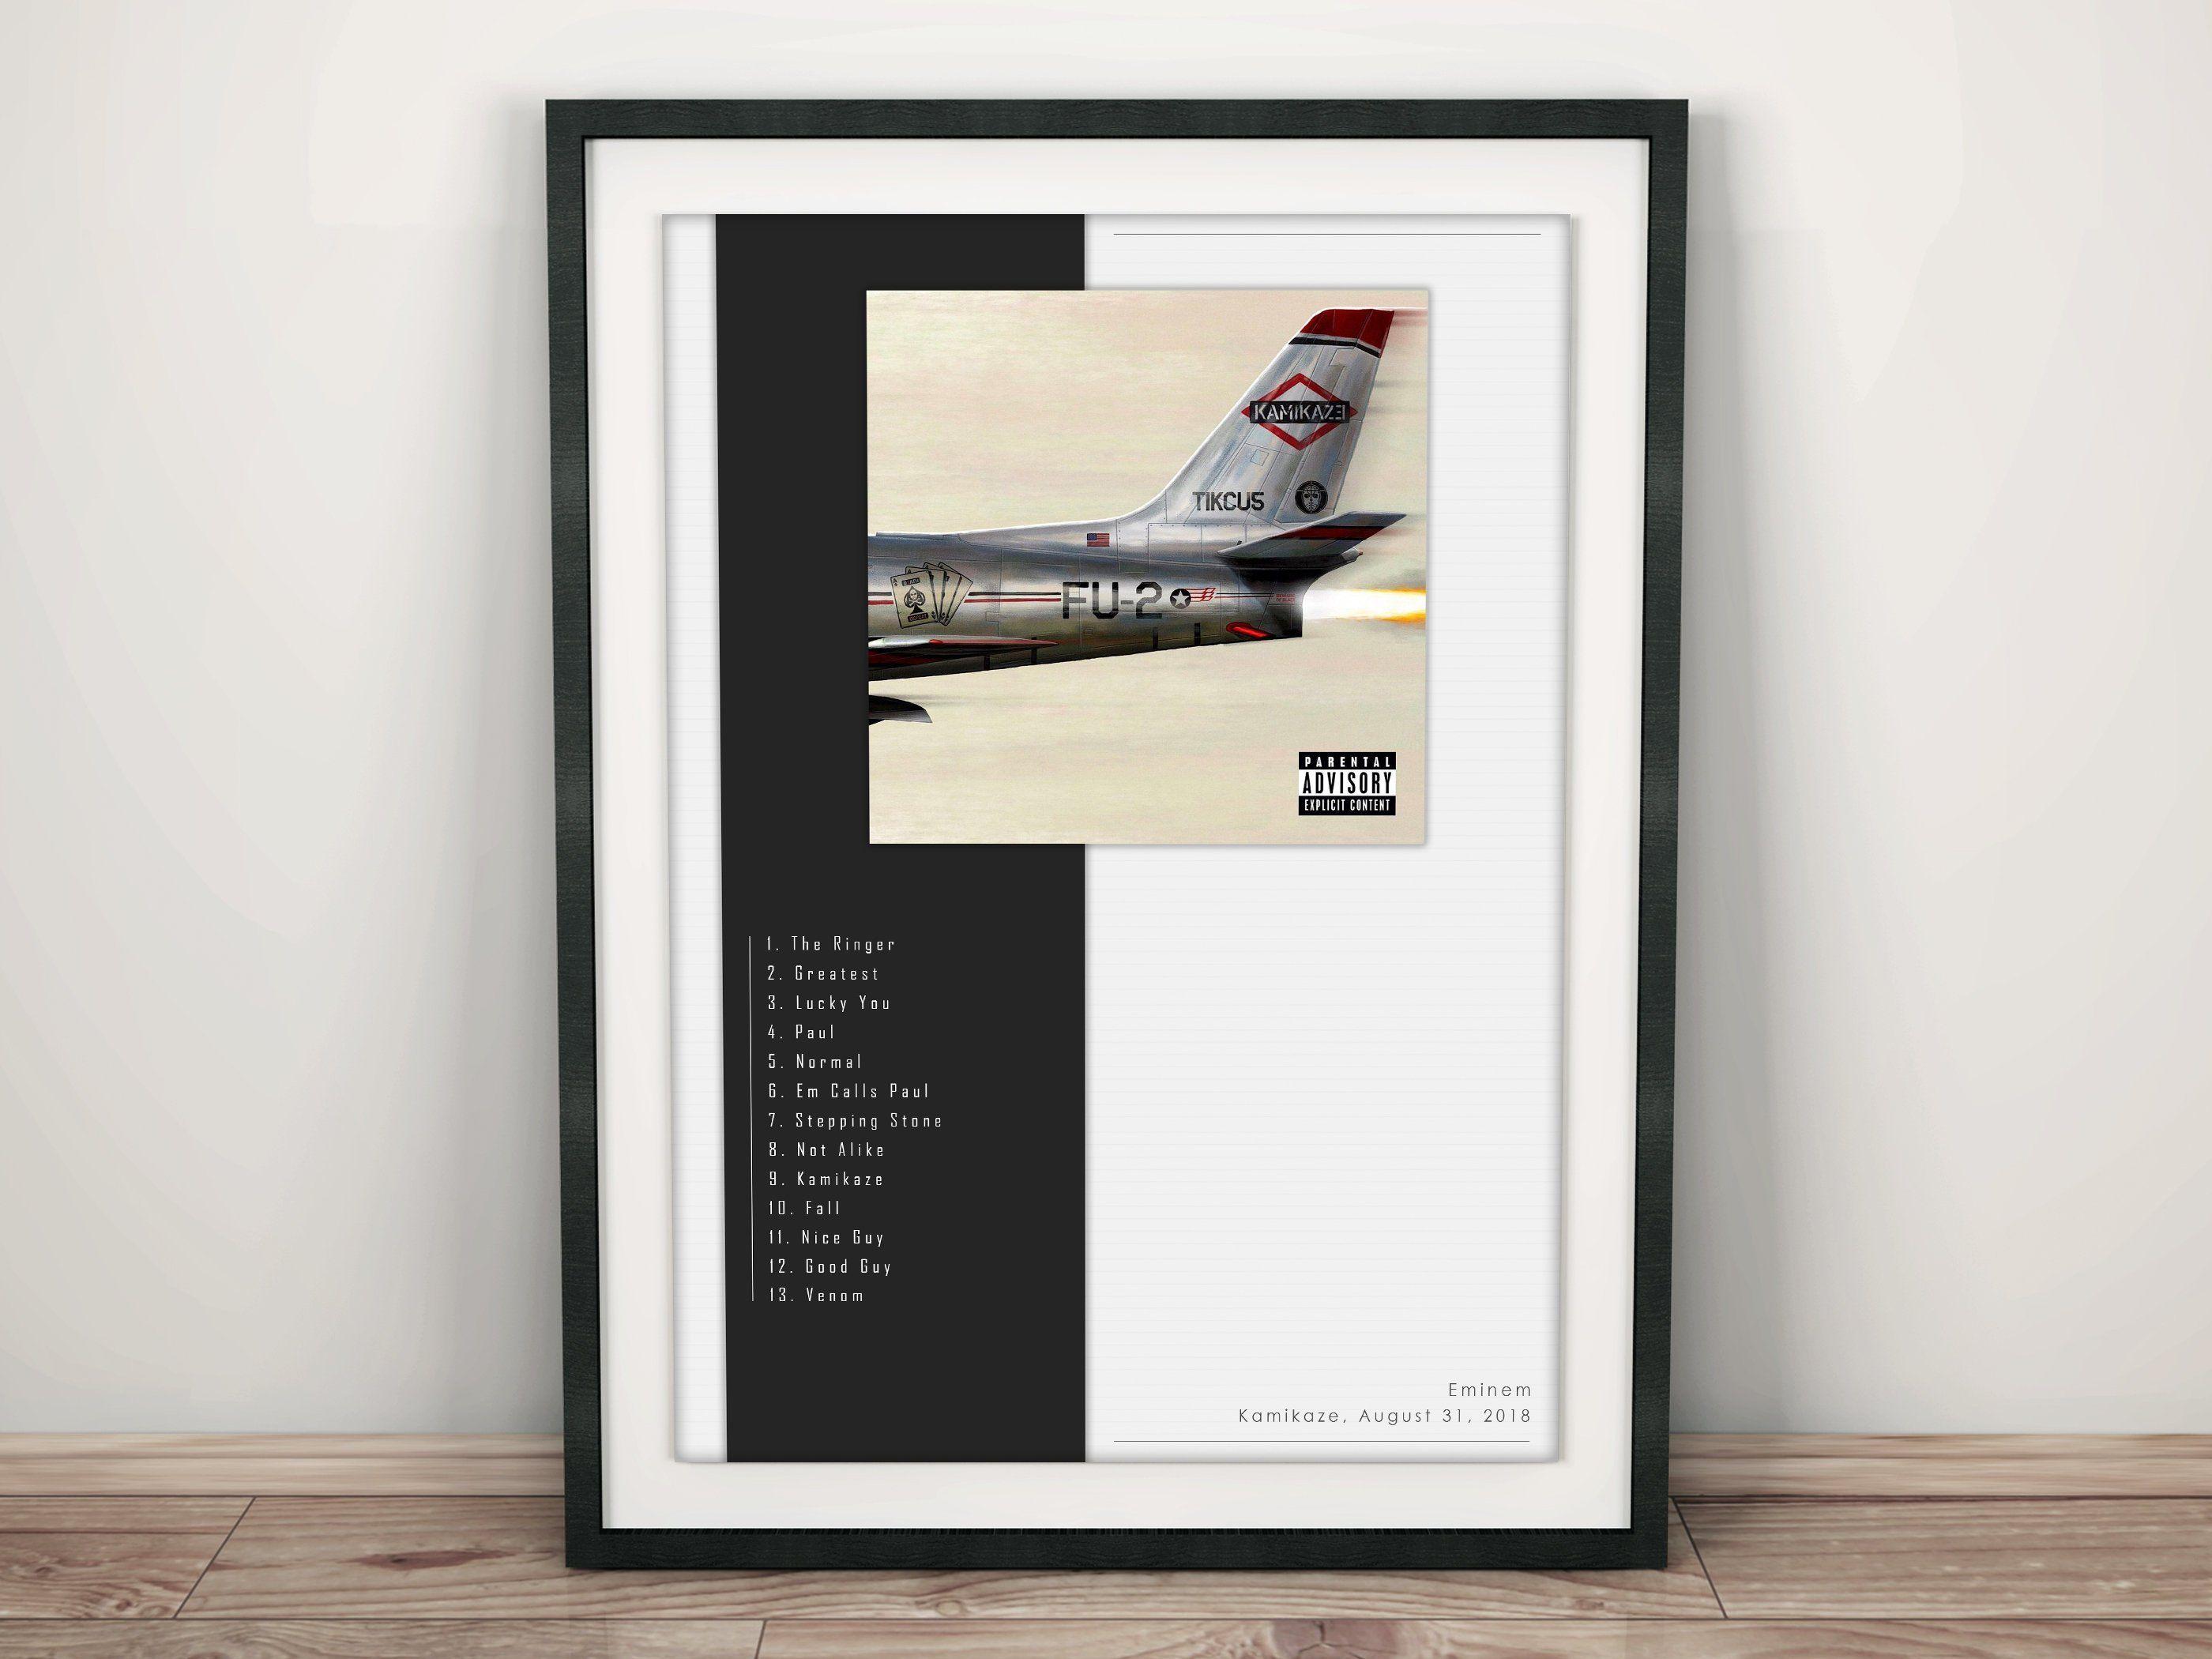 Eminem - Kamikaze / Album Cover Poster [High Quality Poster